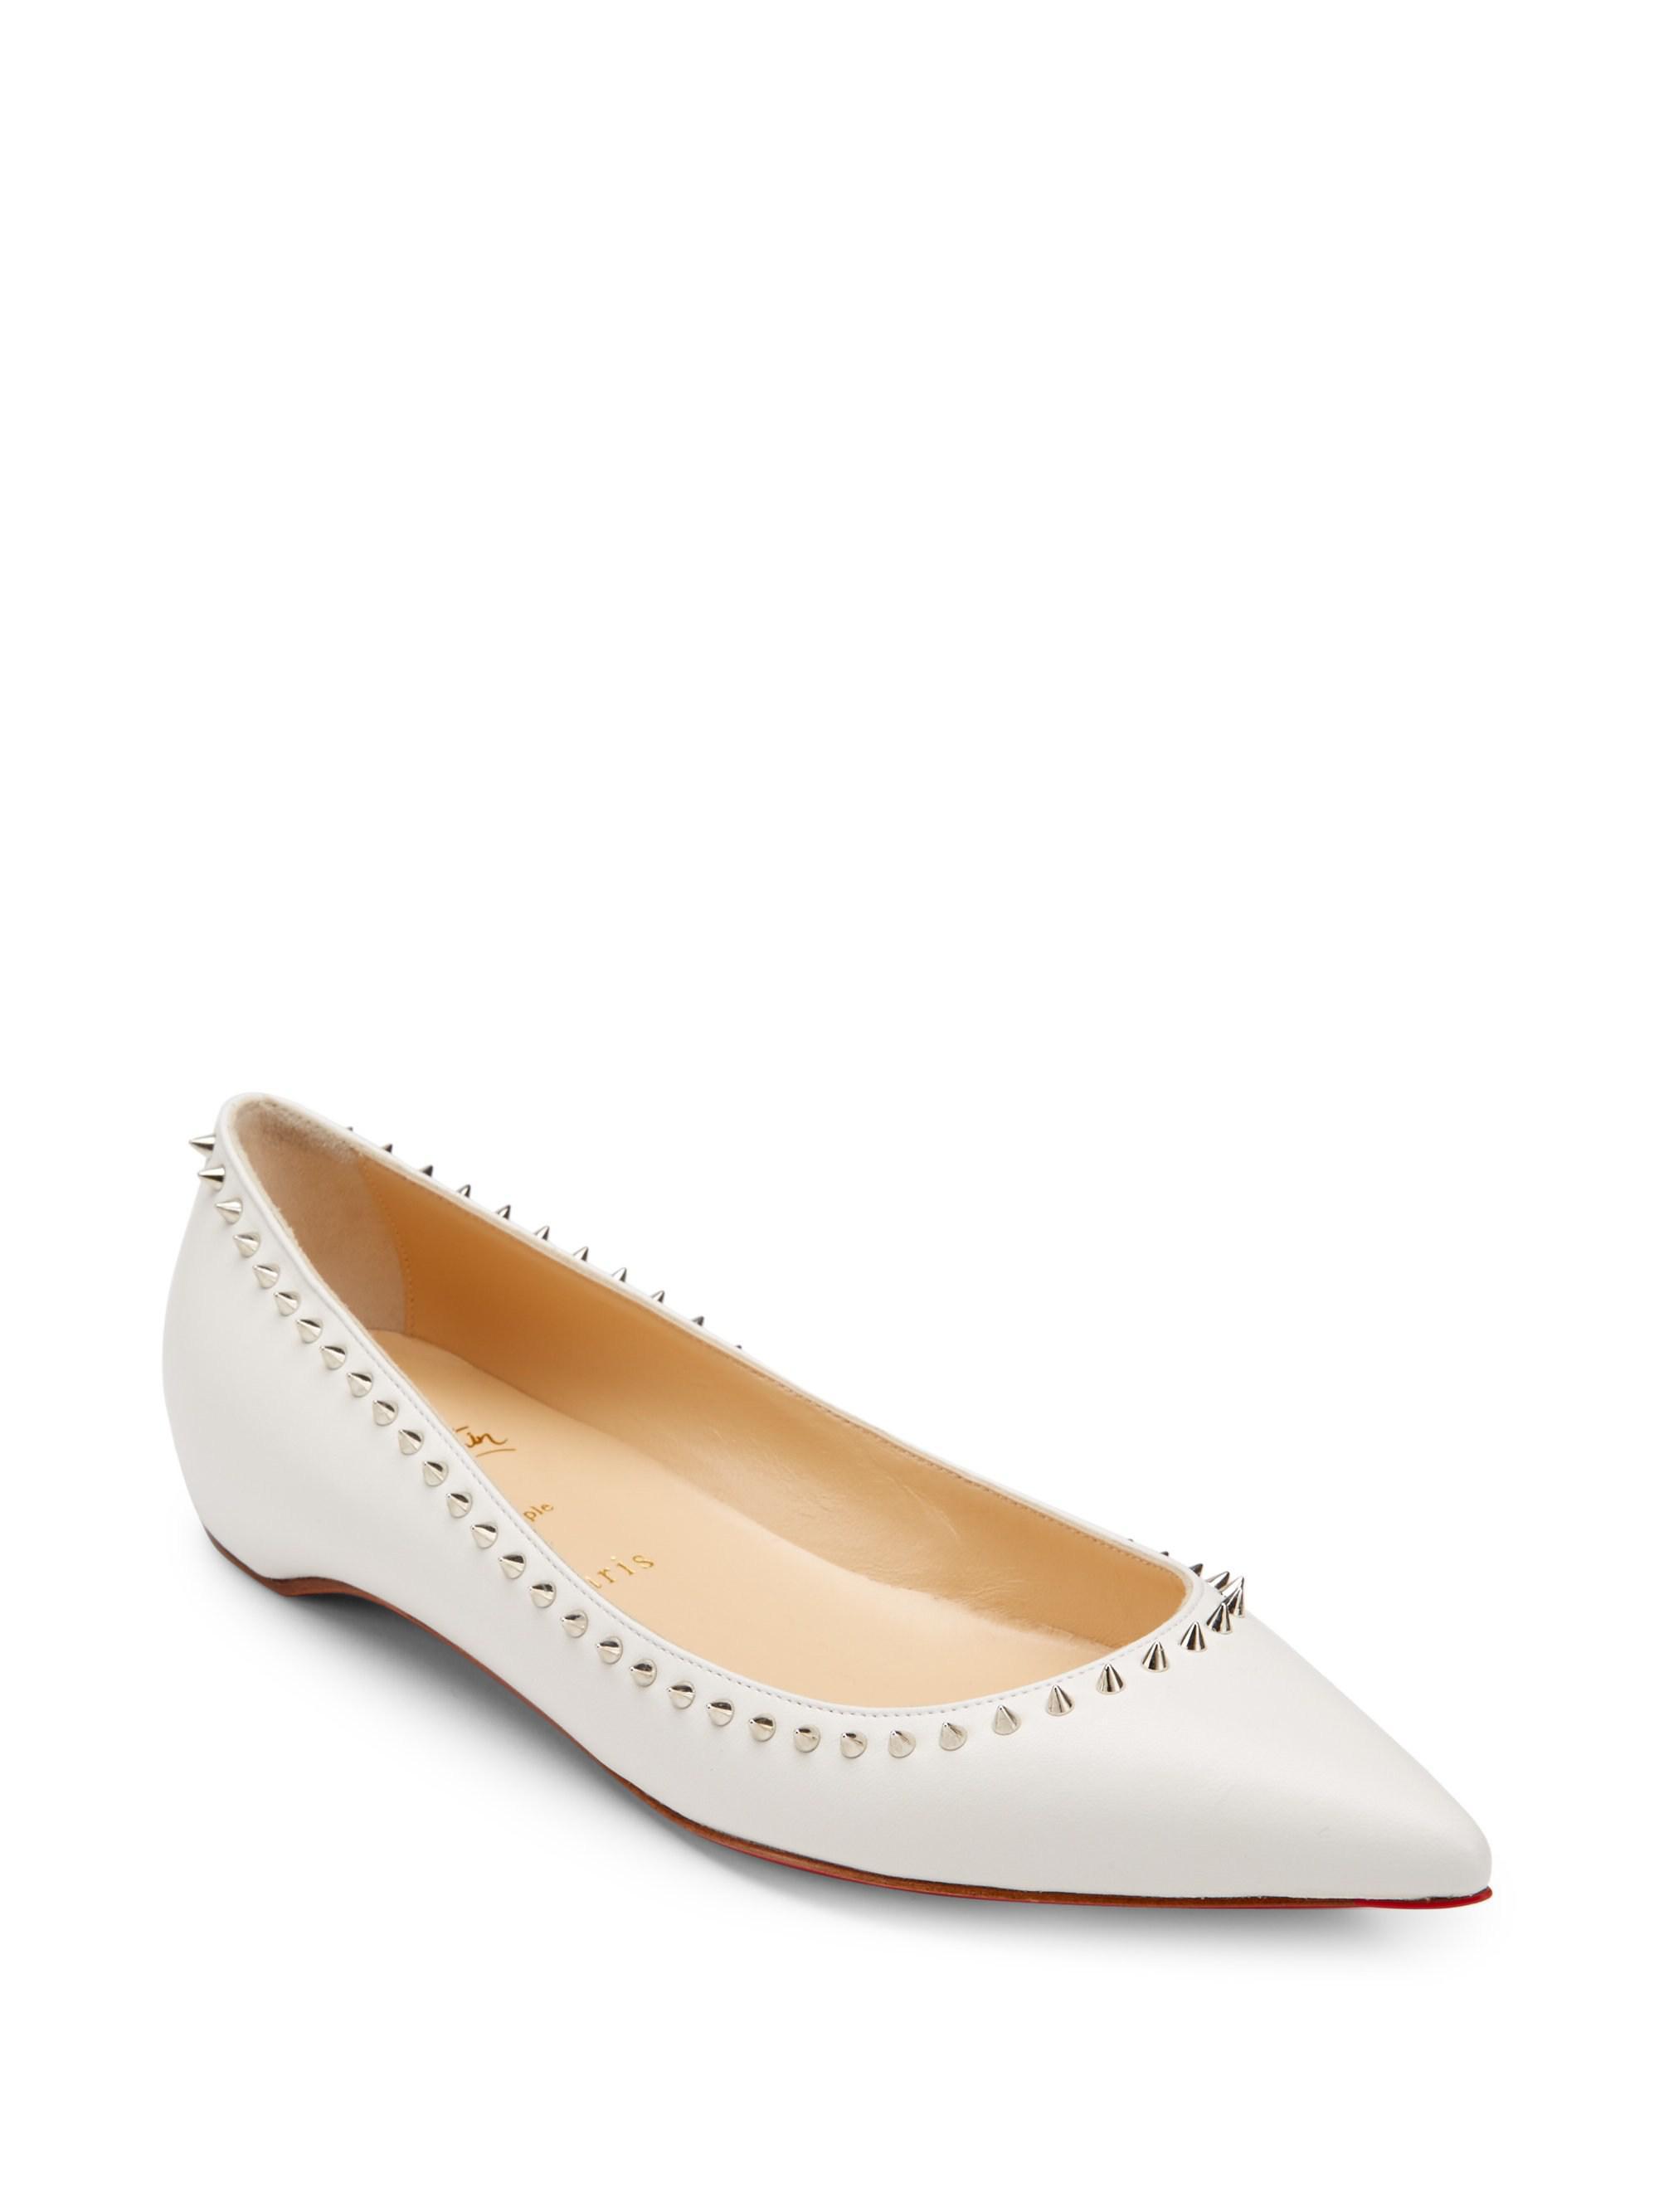 5f045ce7f Christian Louboutin. Women's Anjalina Studded Leather Flats